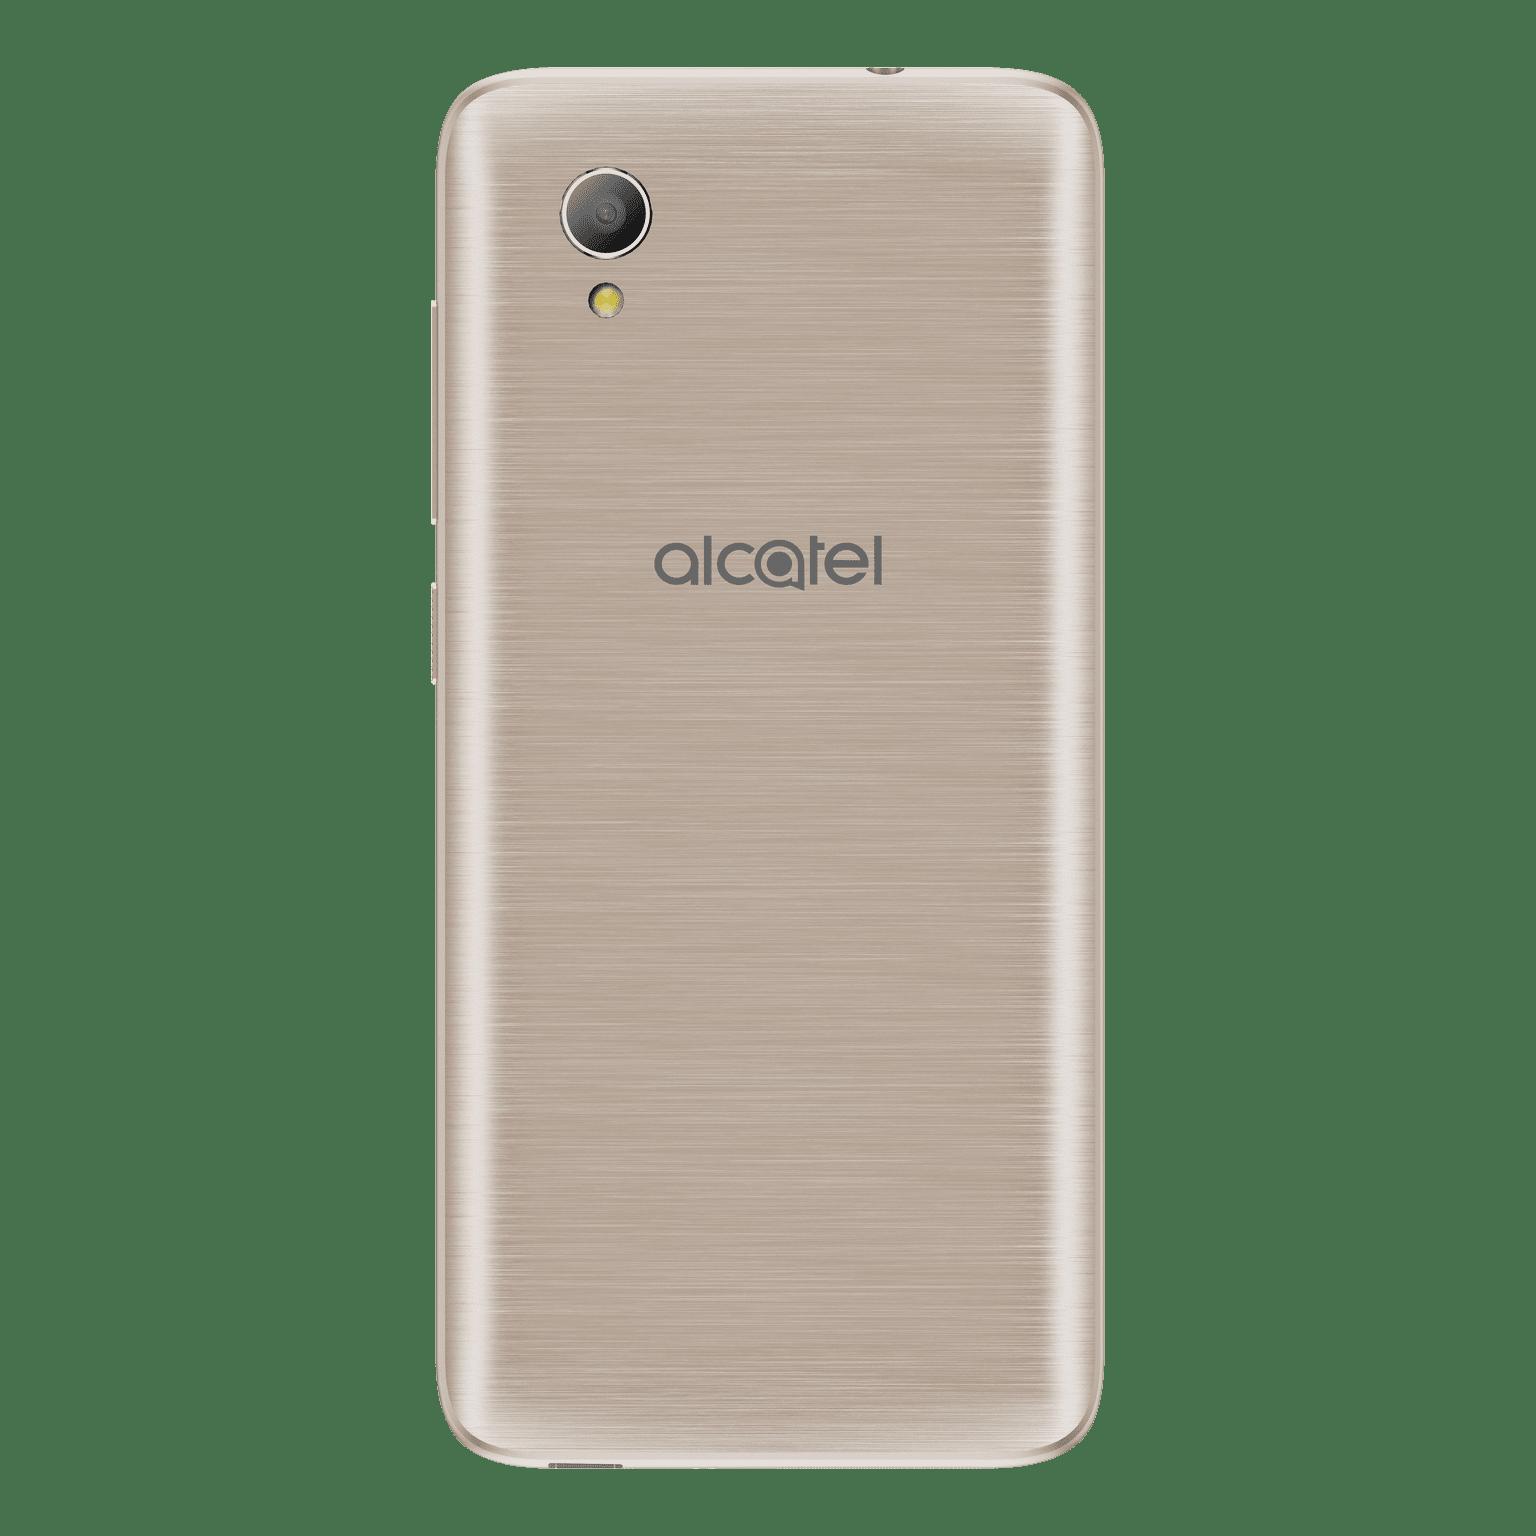 Alcatel выпустил смартфон Alcatel 1 на Android Go